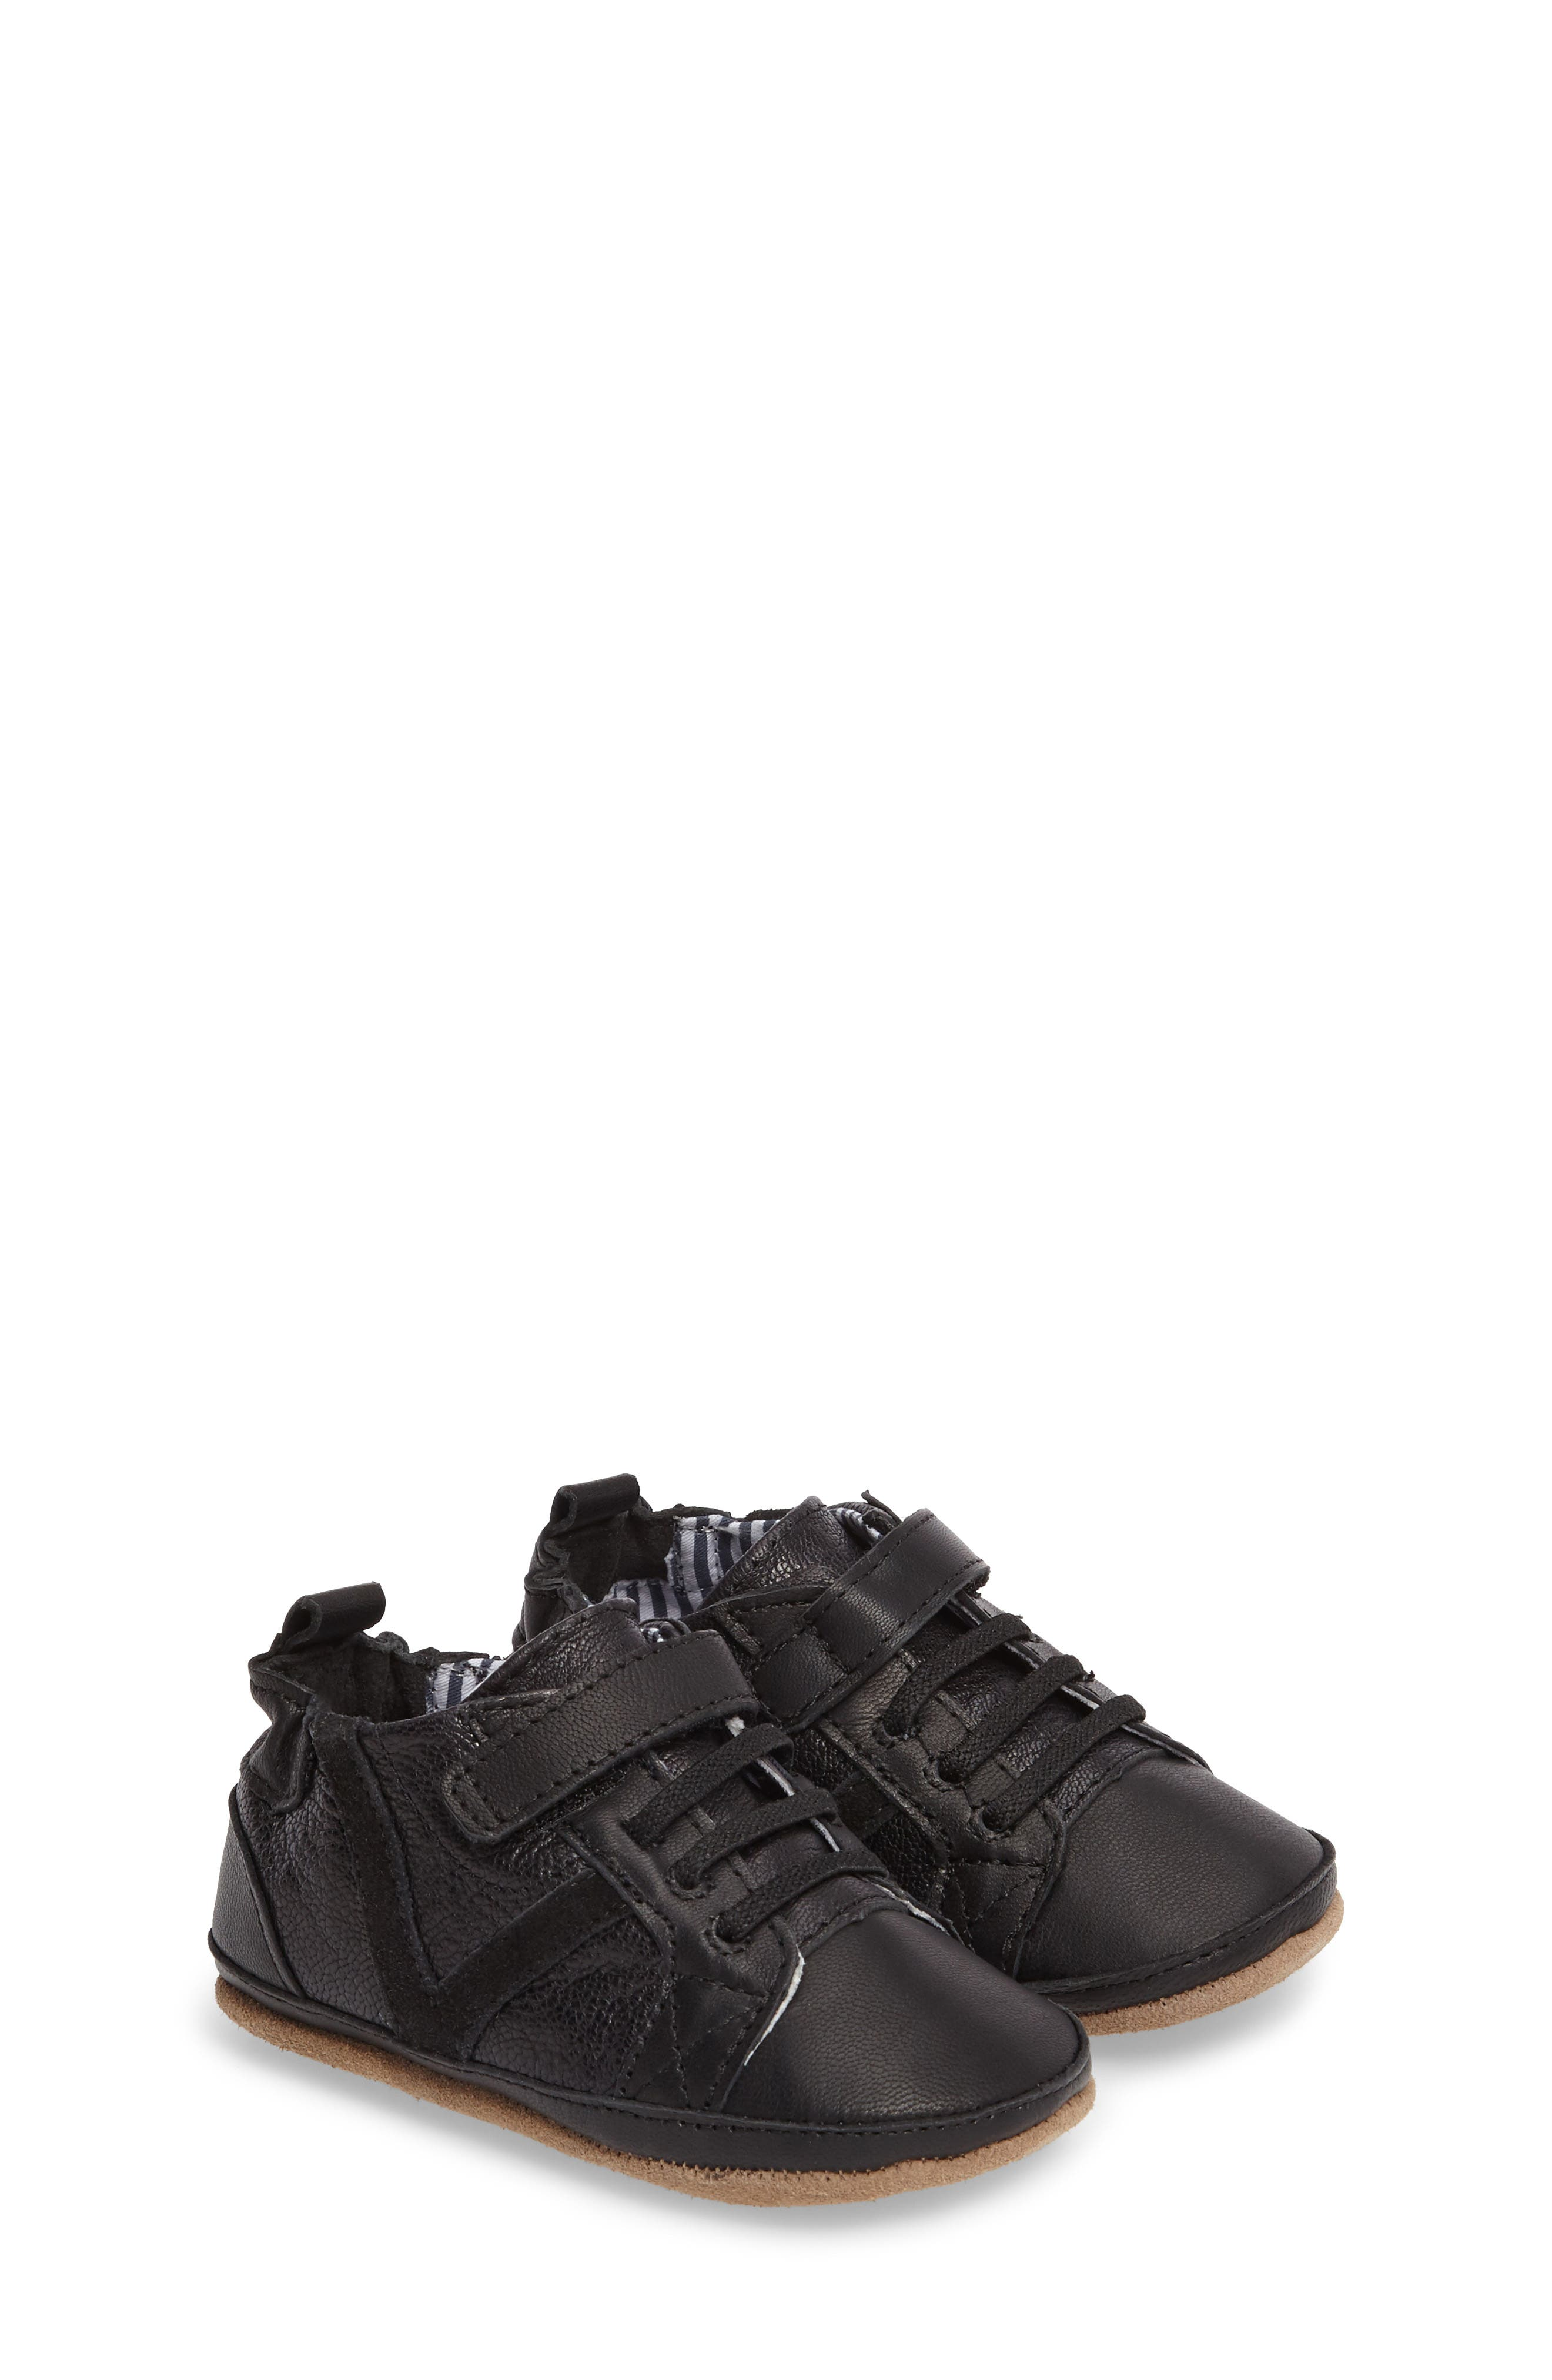 Alternate Image 1 Selected - Robeez® Asher Crib Shoe (Baby & Walker)